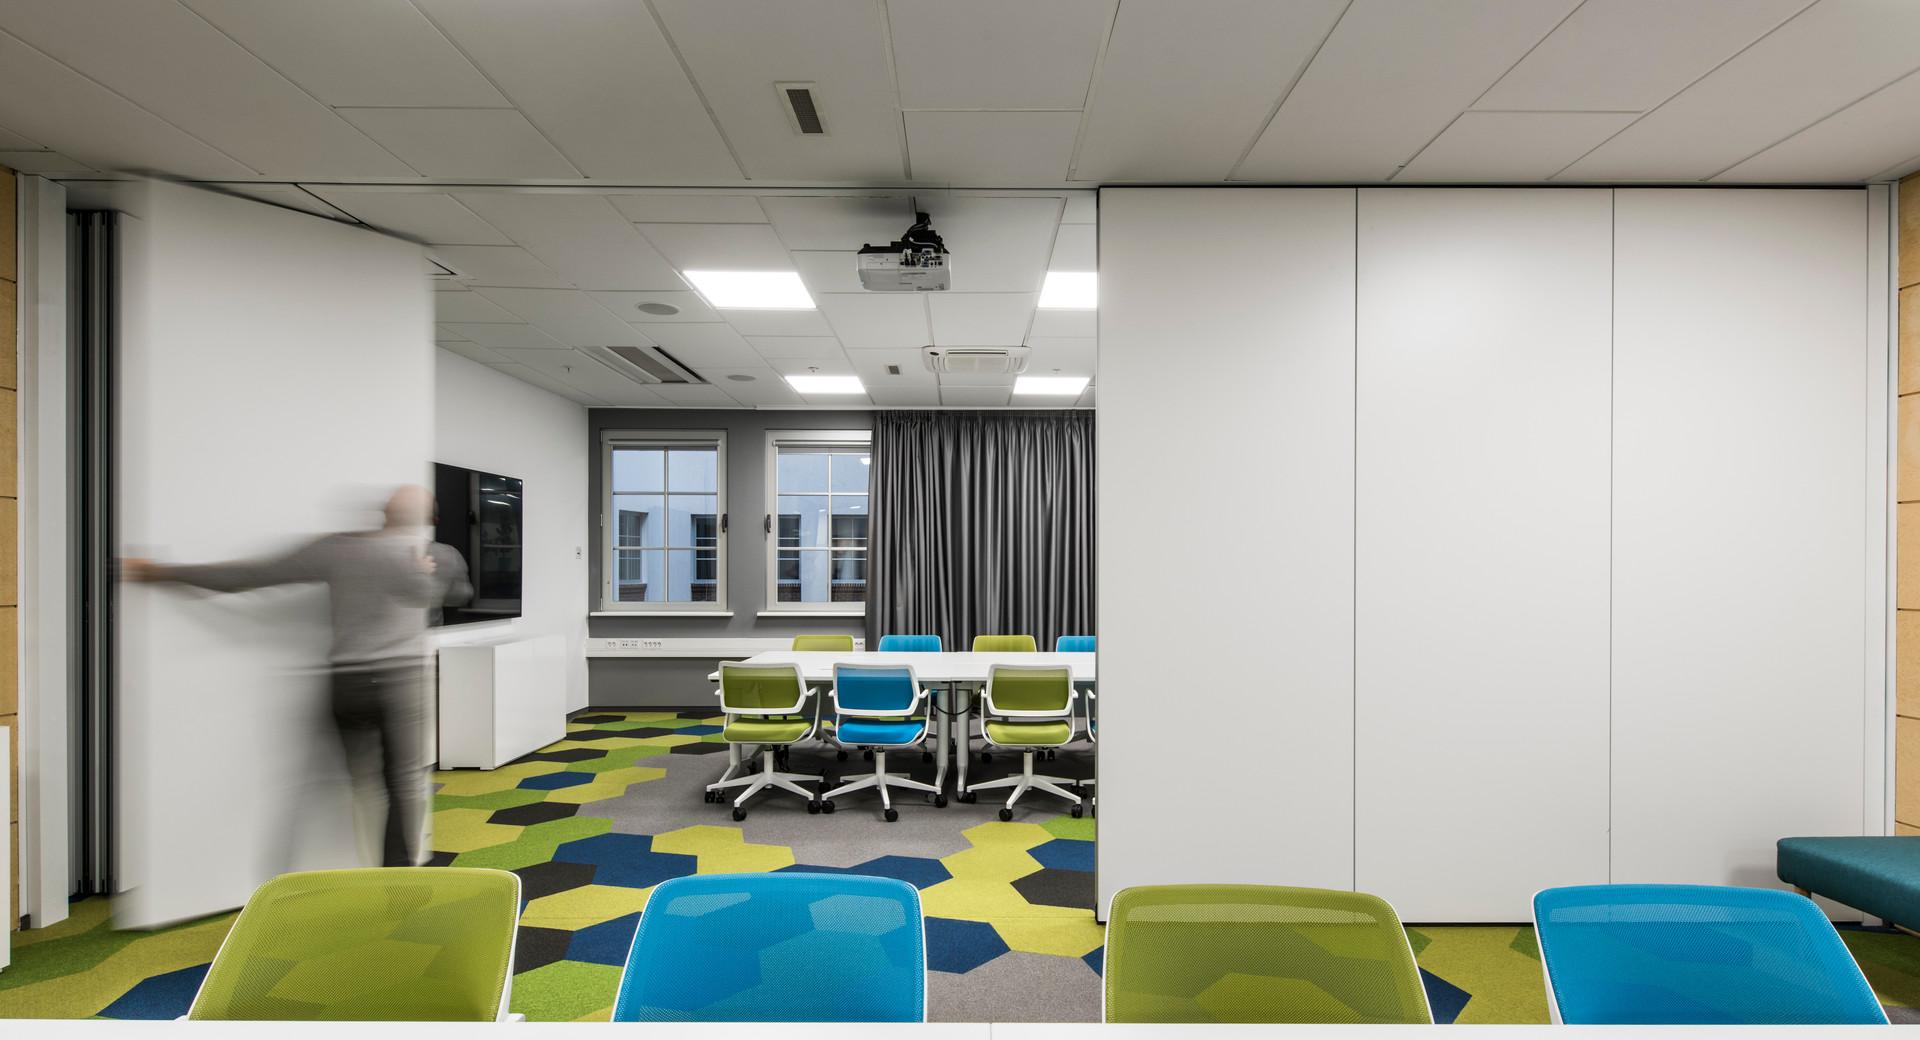 BROLIAISHAUNUOLIAI interior design 1.